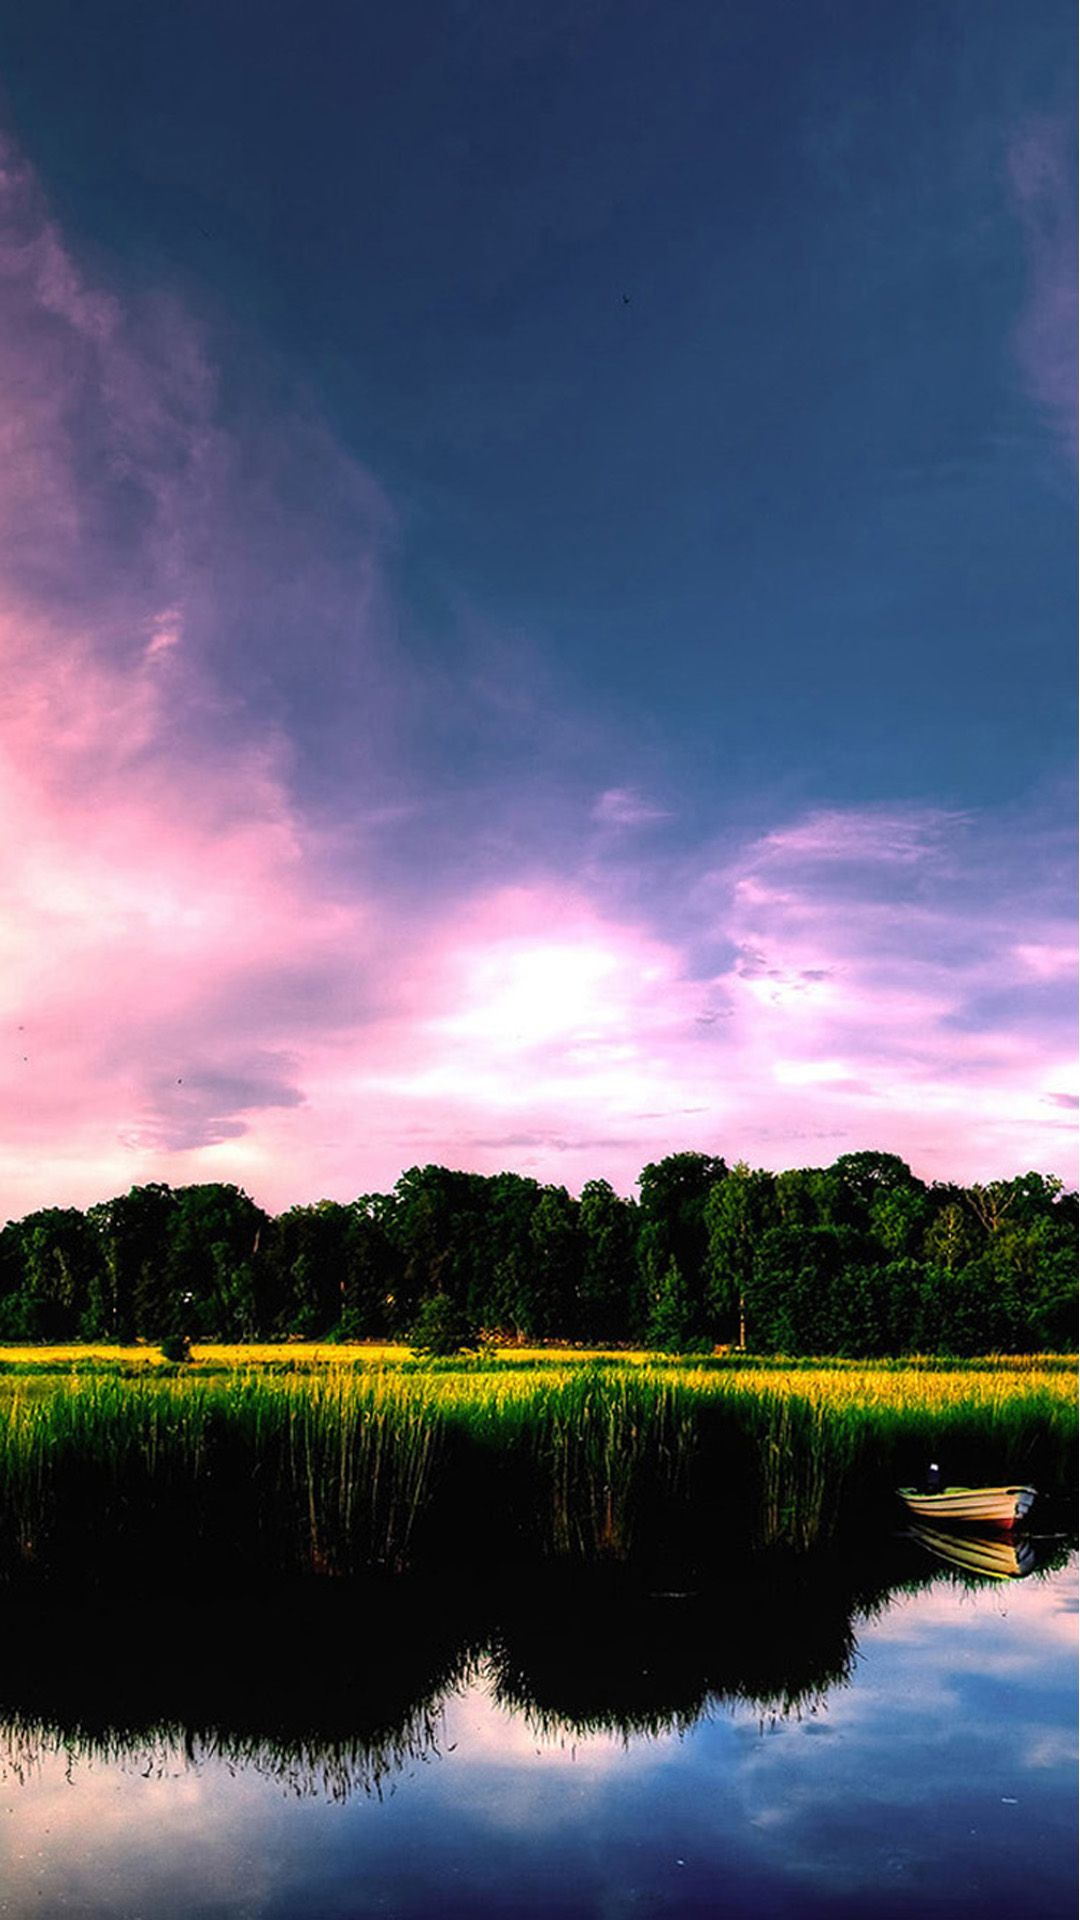 Nature Calm Lake Landscape Iphone 6 Plus Wallpaper Forest Landscape Lake Landscape Scenery Wallpaper